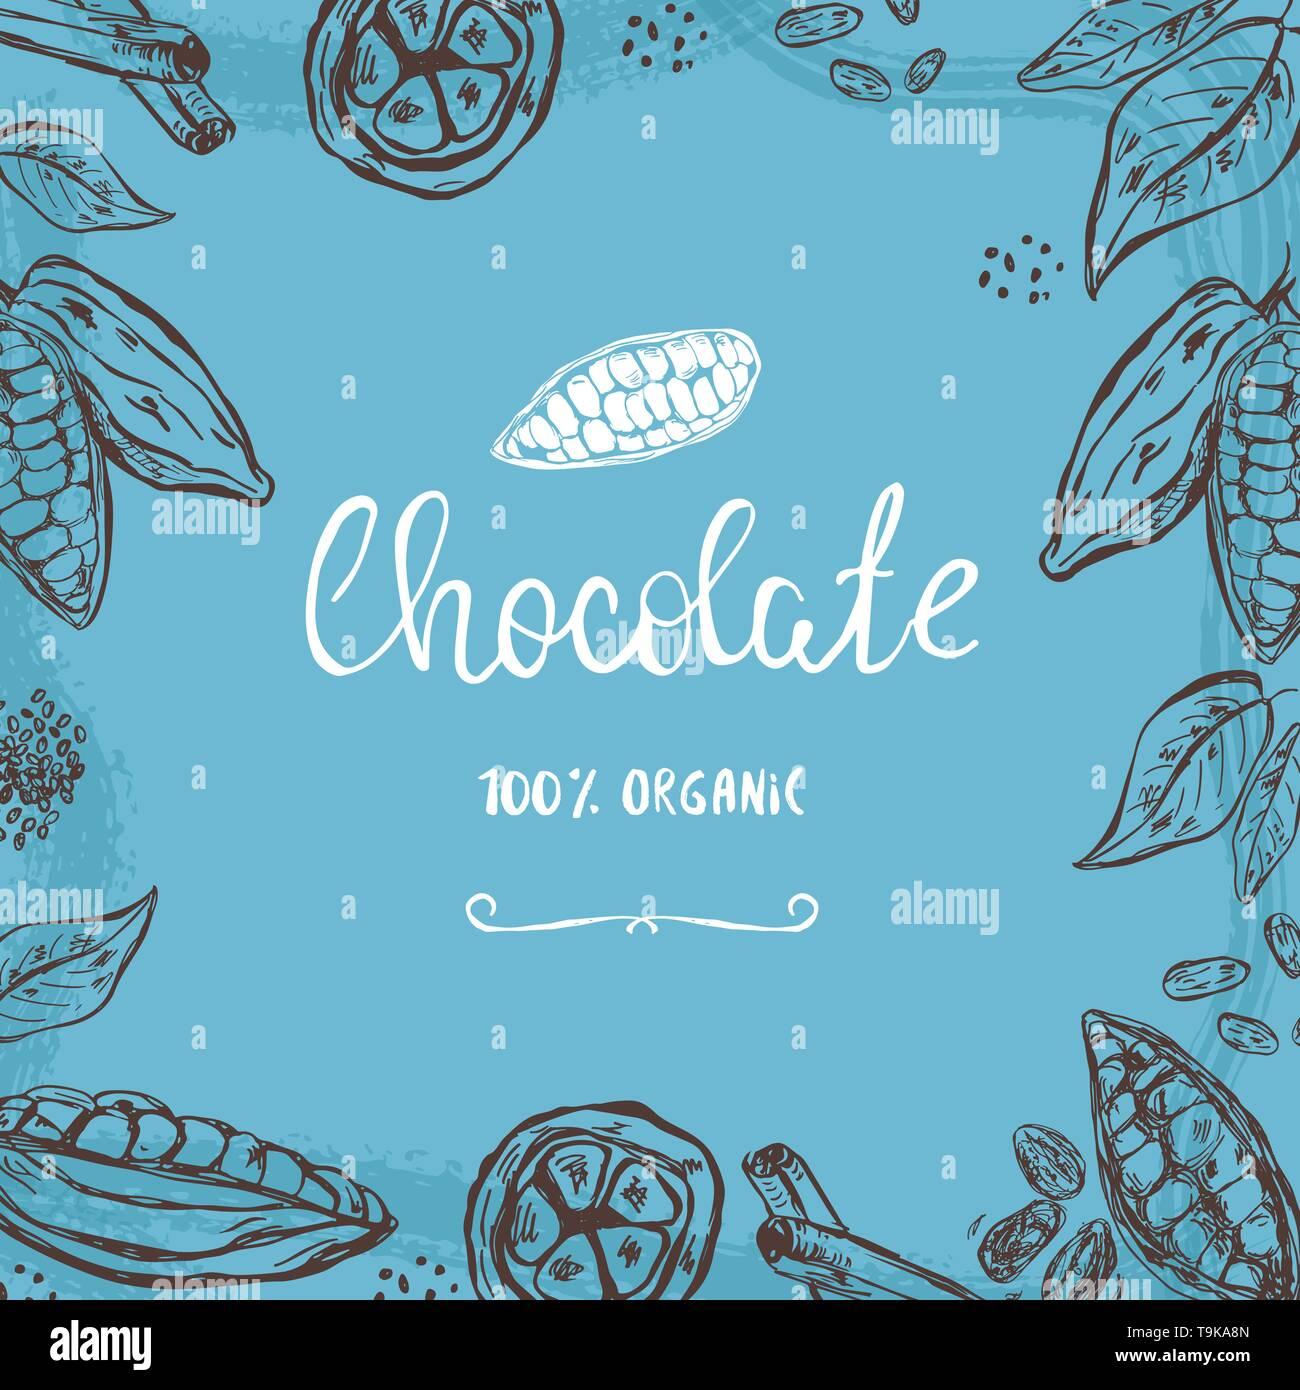 Cocoa Pod Illustration Stock Photos & Cocoa Pod